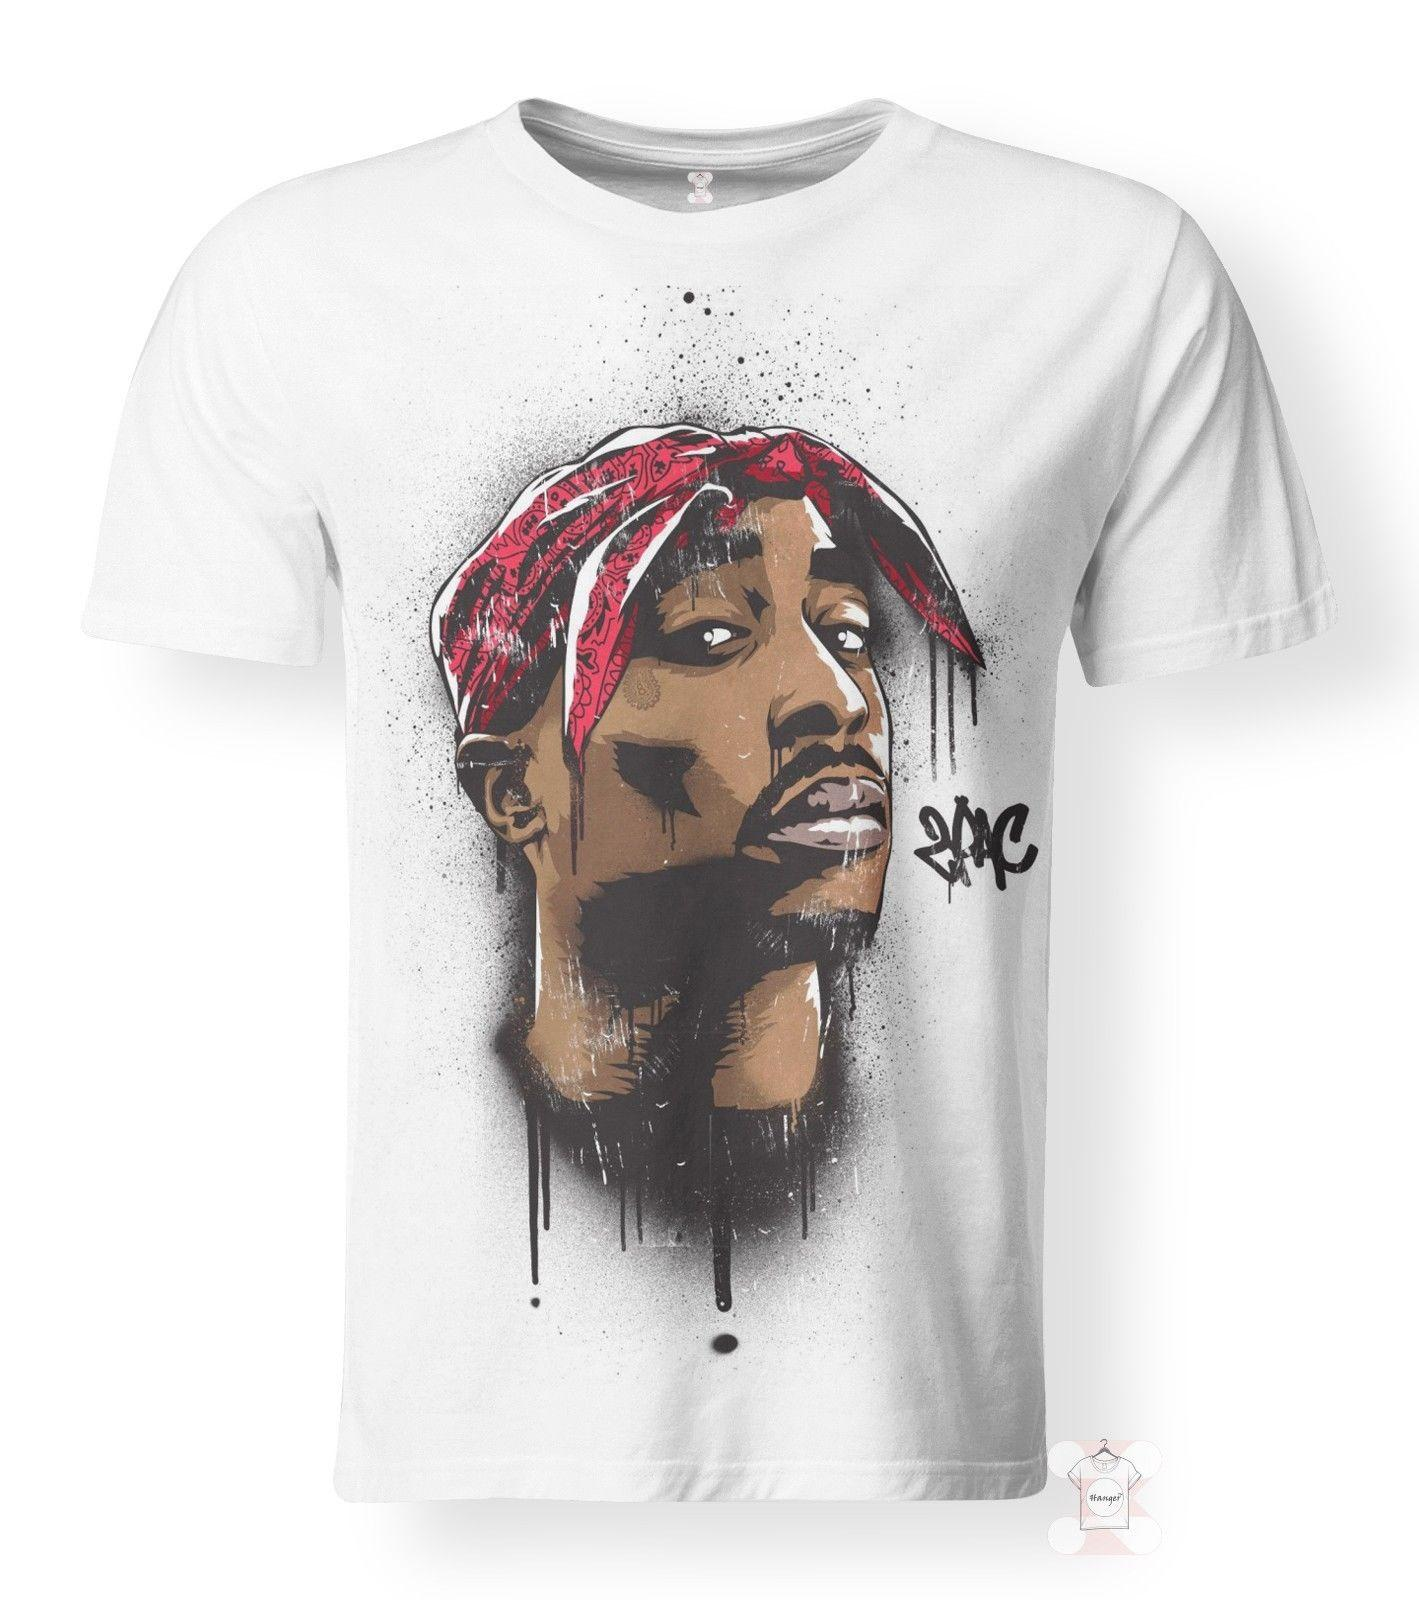 cc23244c 2Pac T Shirt Legendary Rapper Tupac Shakur Hip Hop Icon NEW 3D Print Women  Men Top T Shirt Ts Shirts A Team Shirts From Biecup, $16.24| DHgate.Com